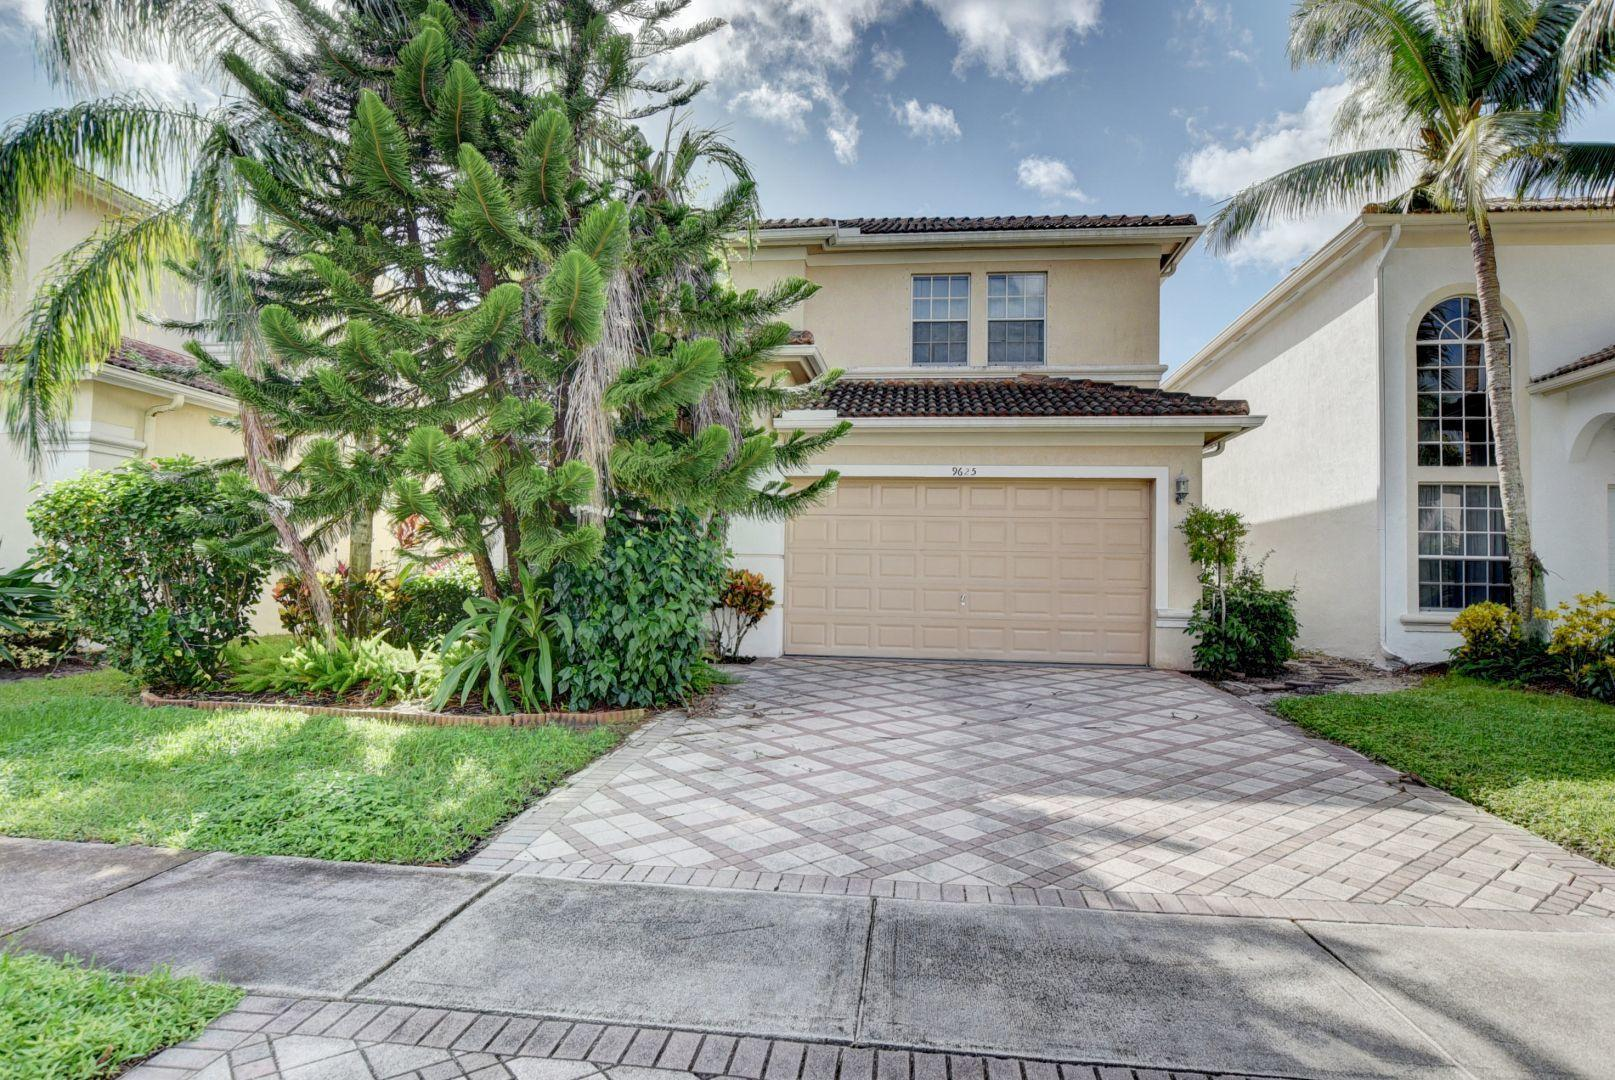 Home for sale in Vineyards Boca Raton Florida